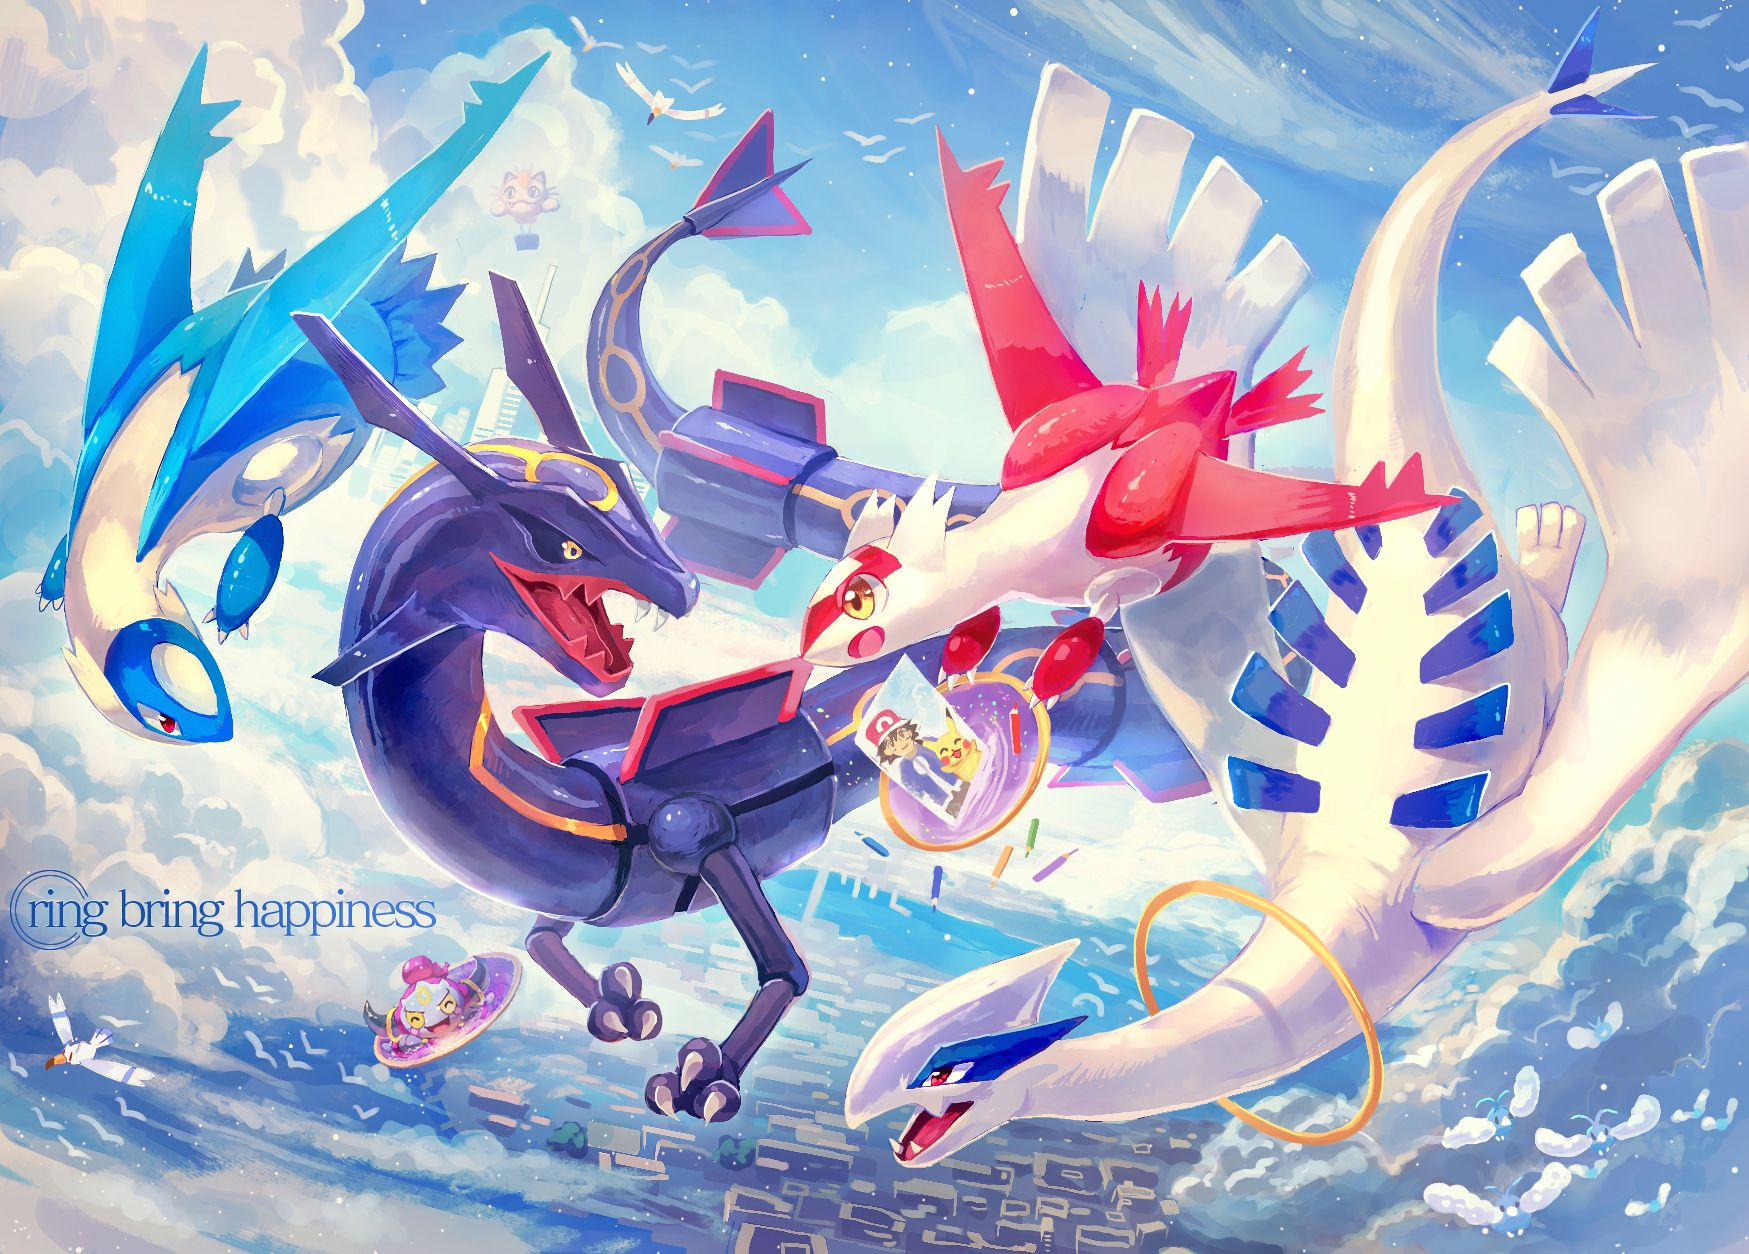 Pokemon pixiv Latias Latios shiny Rayquaza Lugia and Hoopa 1749x1254